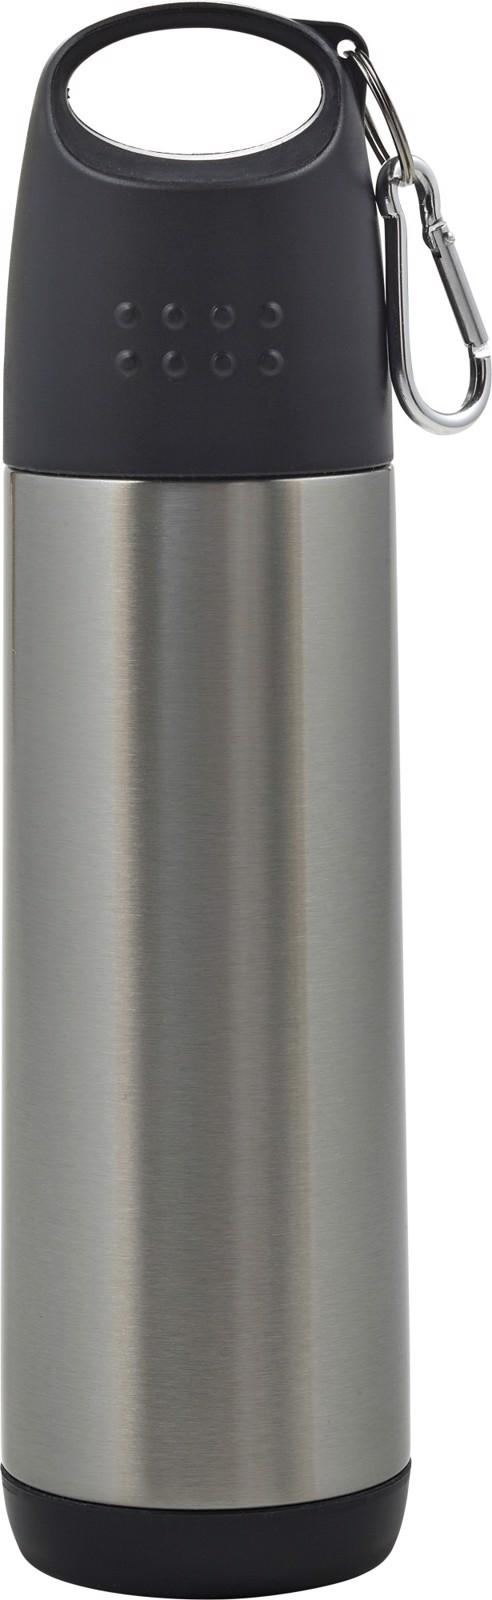 Aluminium double walled bottle - Silver